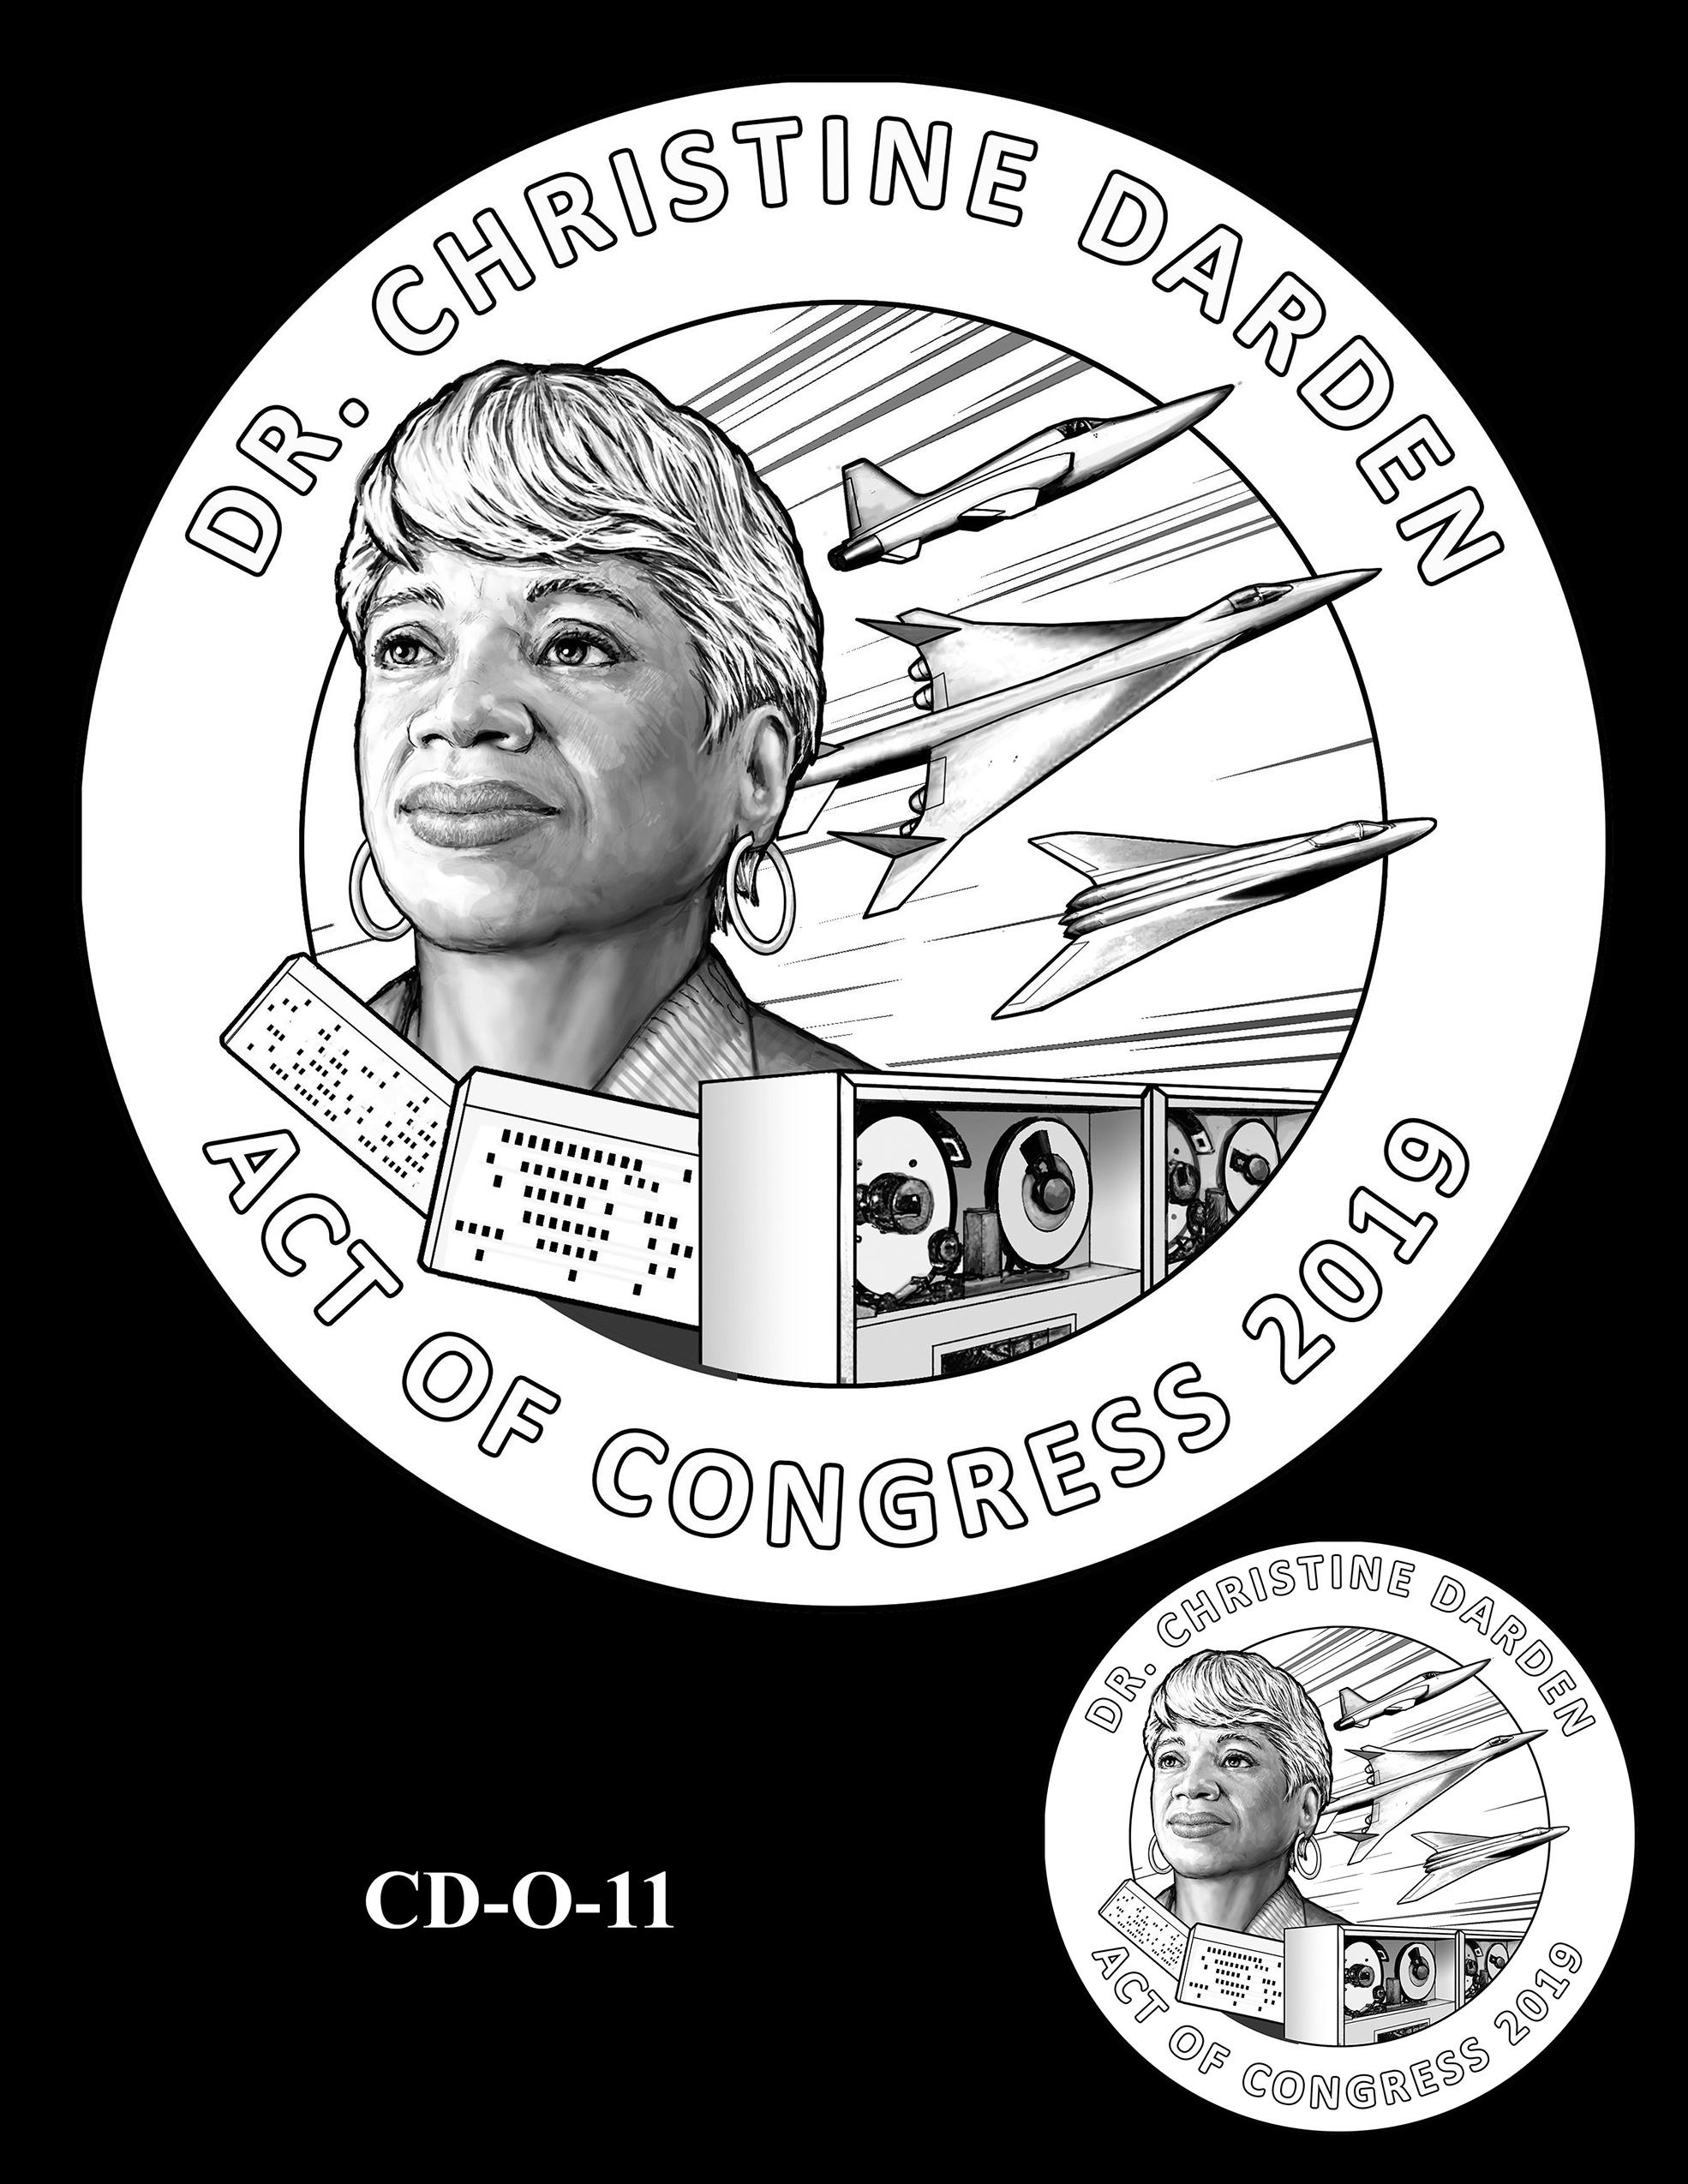 CD-O-11 -- Dr. Christine Darden Congressional Gold Medal